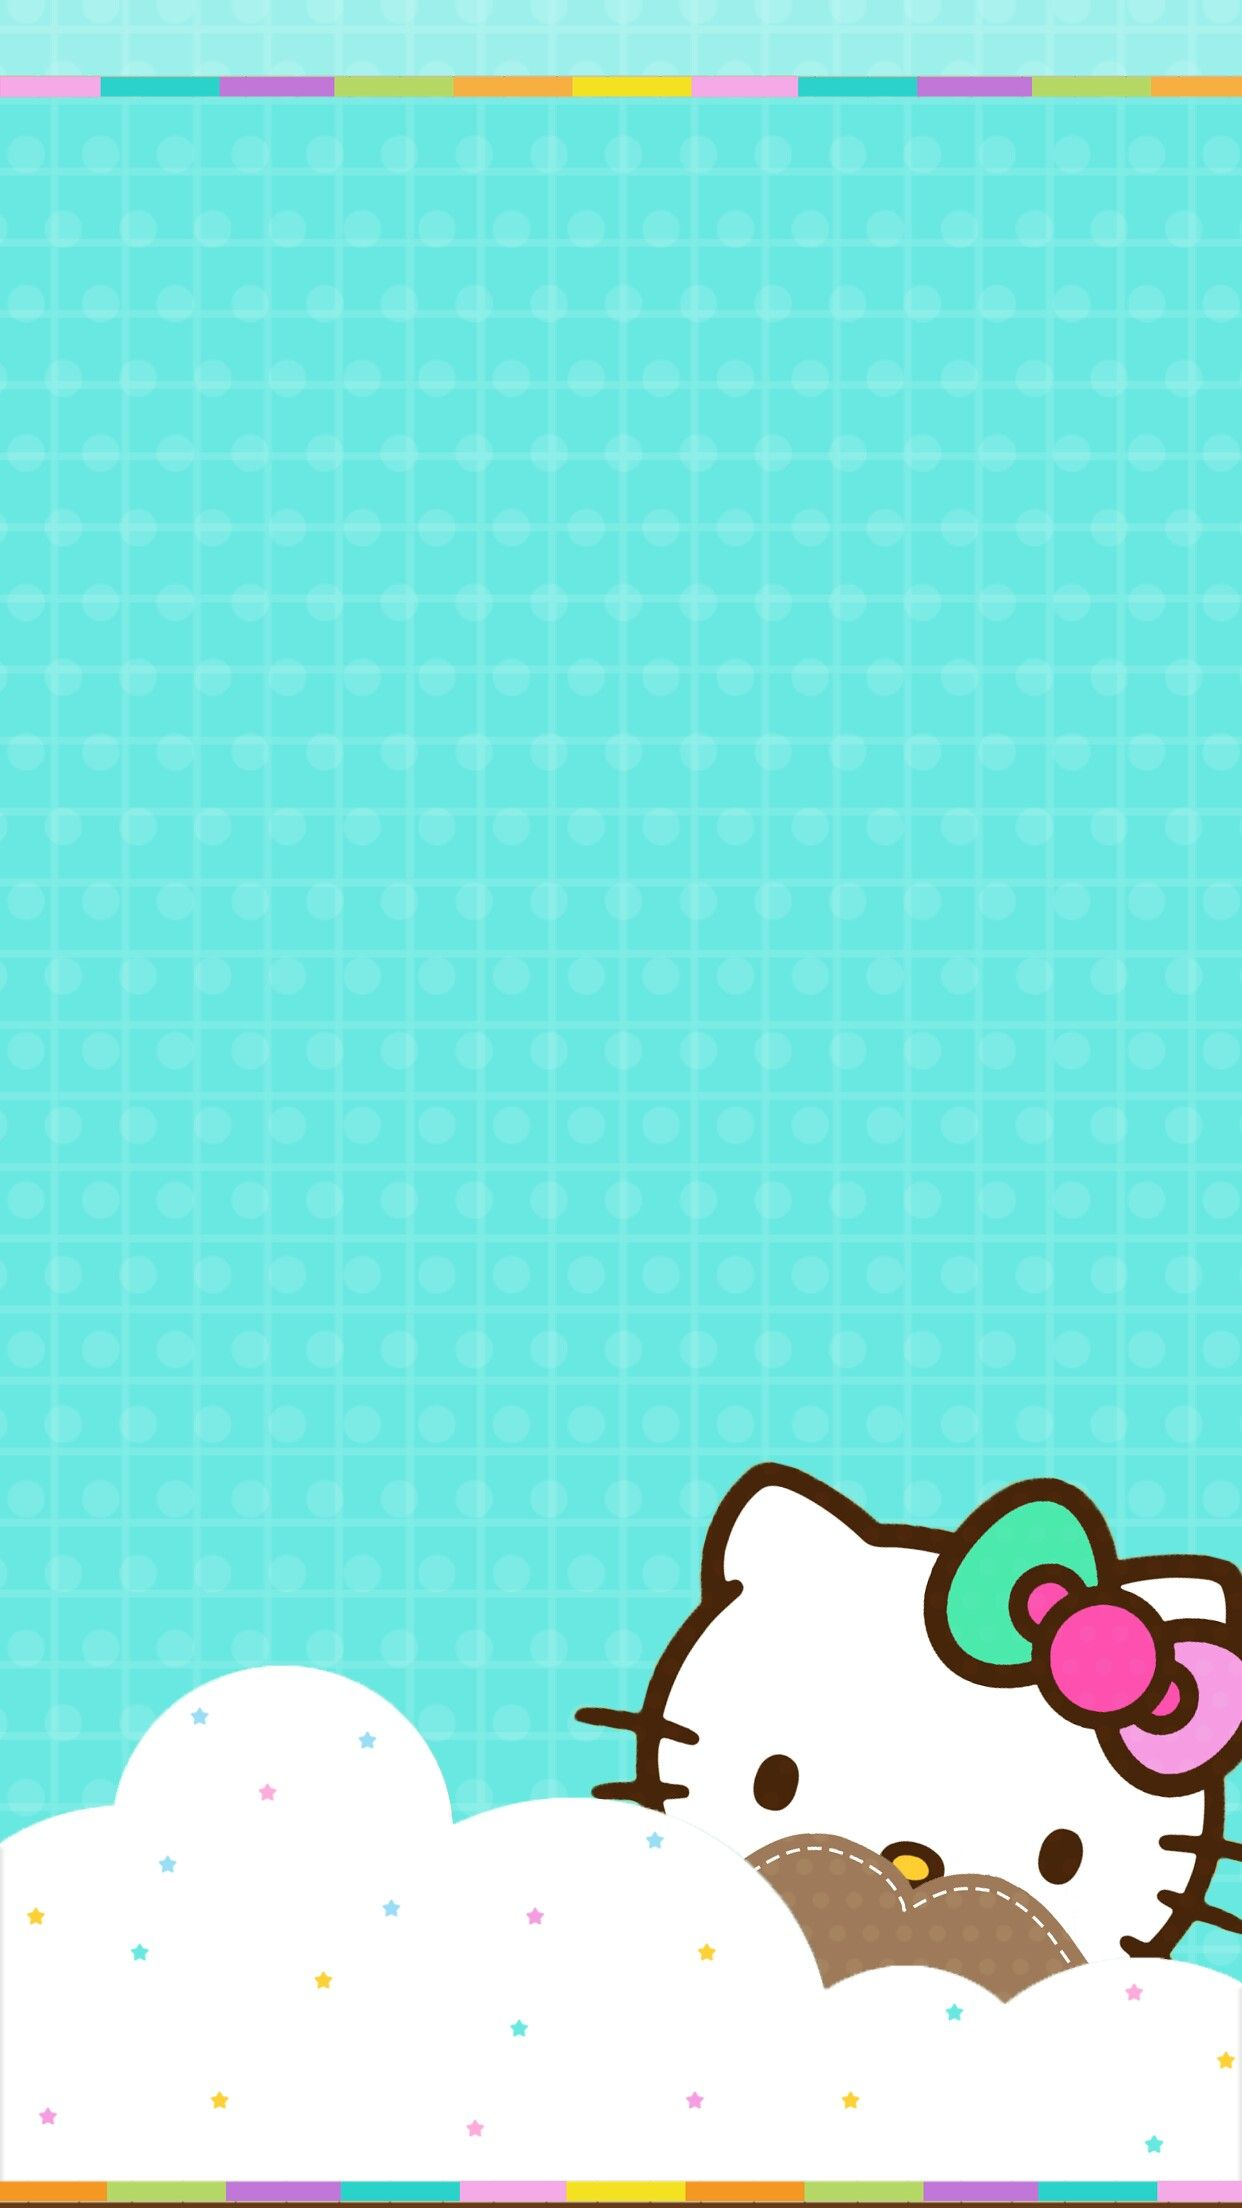 Great Wallpaper Hello Kitty Desktop Background - ef22f37e4ca296f560a6c3d6f73628f9  Snapshot_347652.jpg